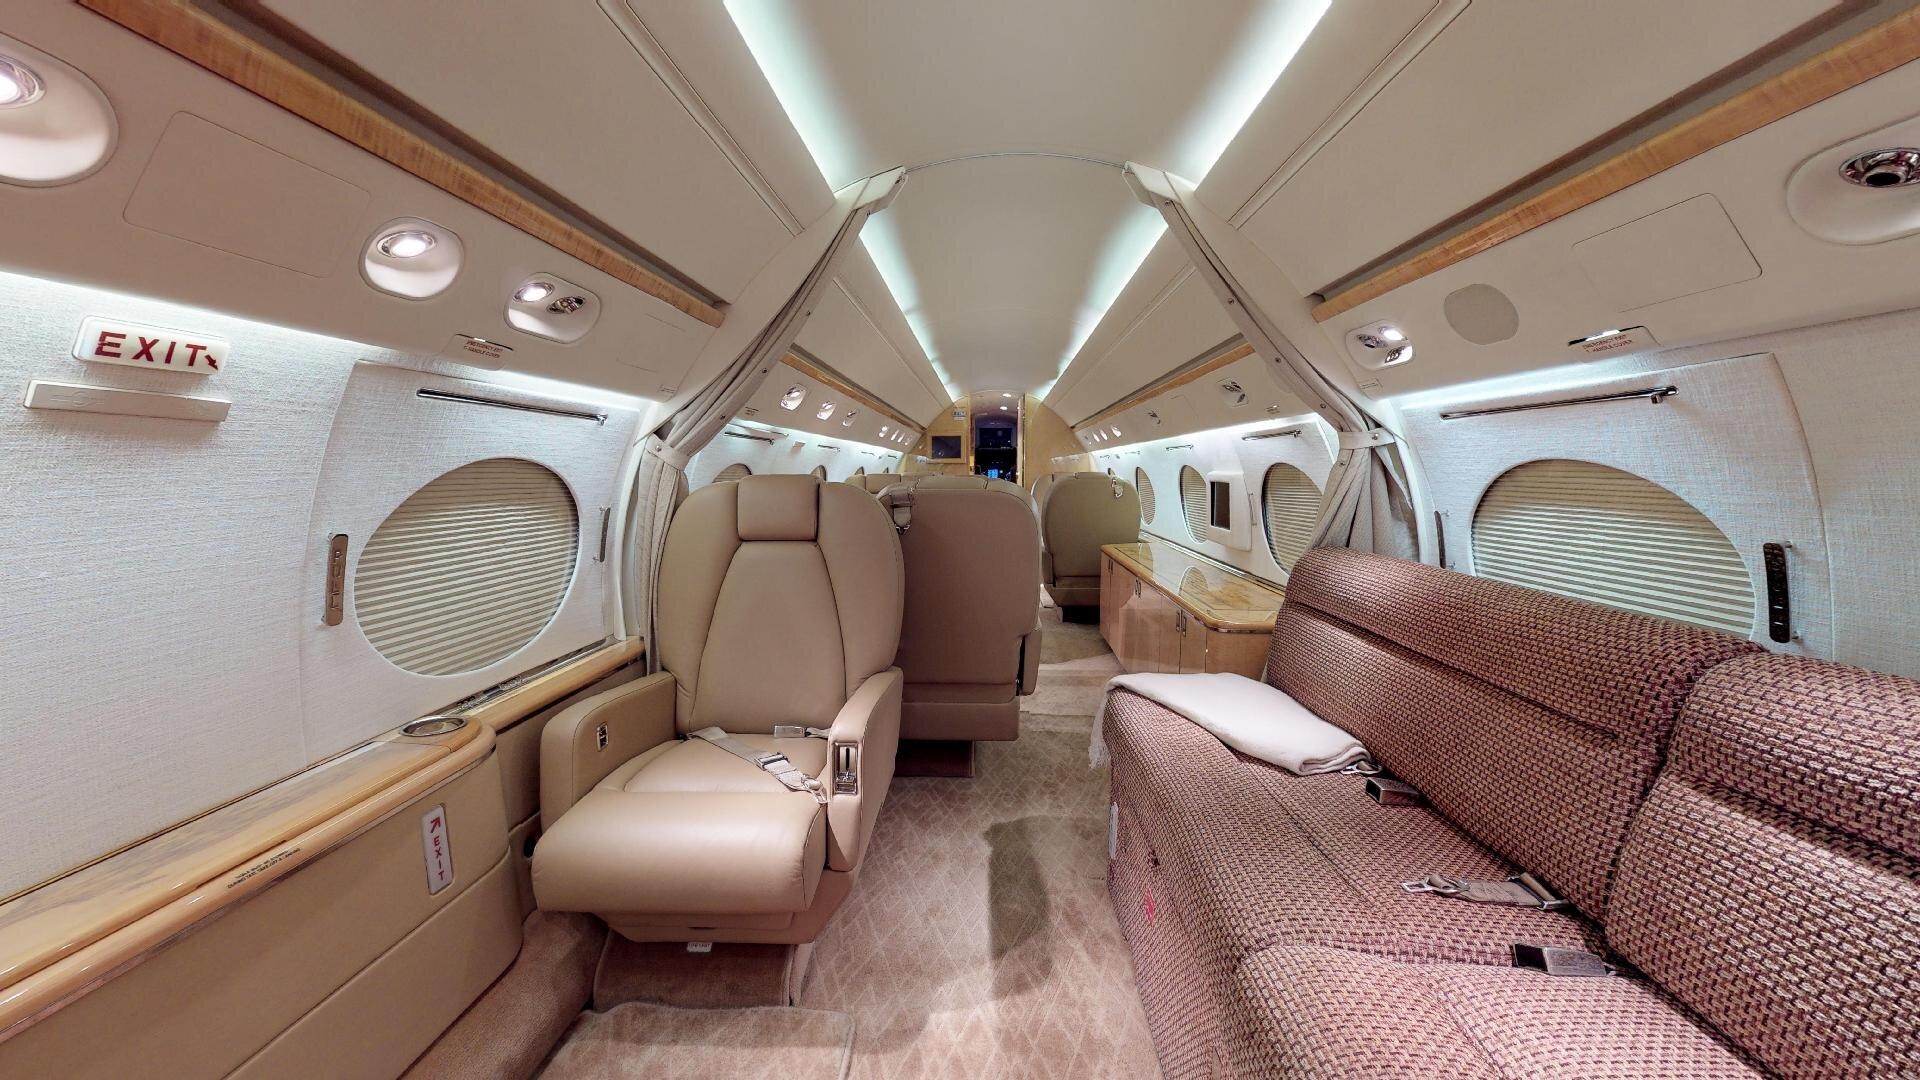 Gulfstream-V-SN-518-09232019_132055.jpg